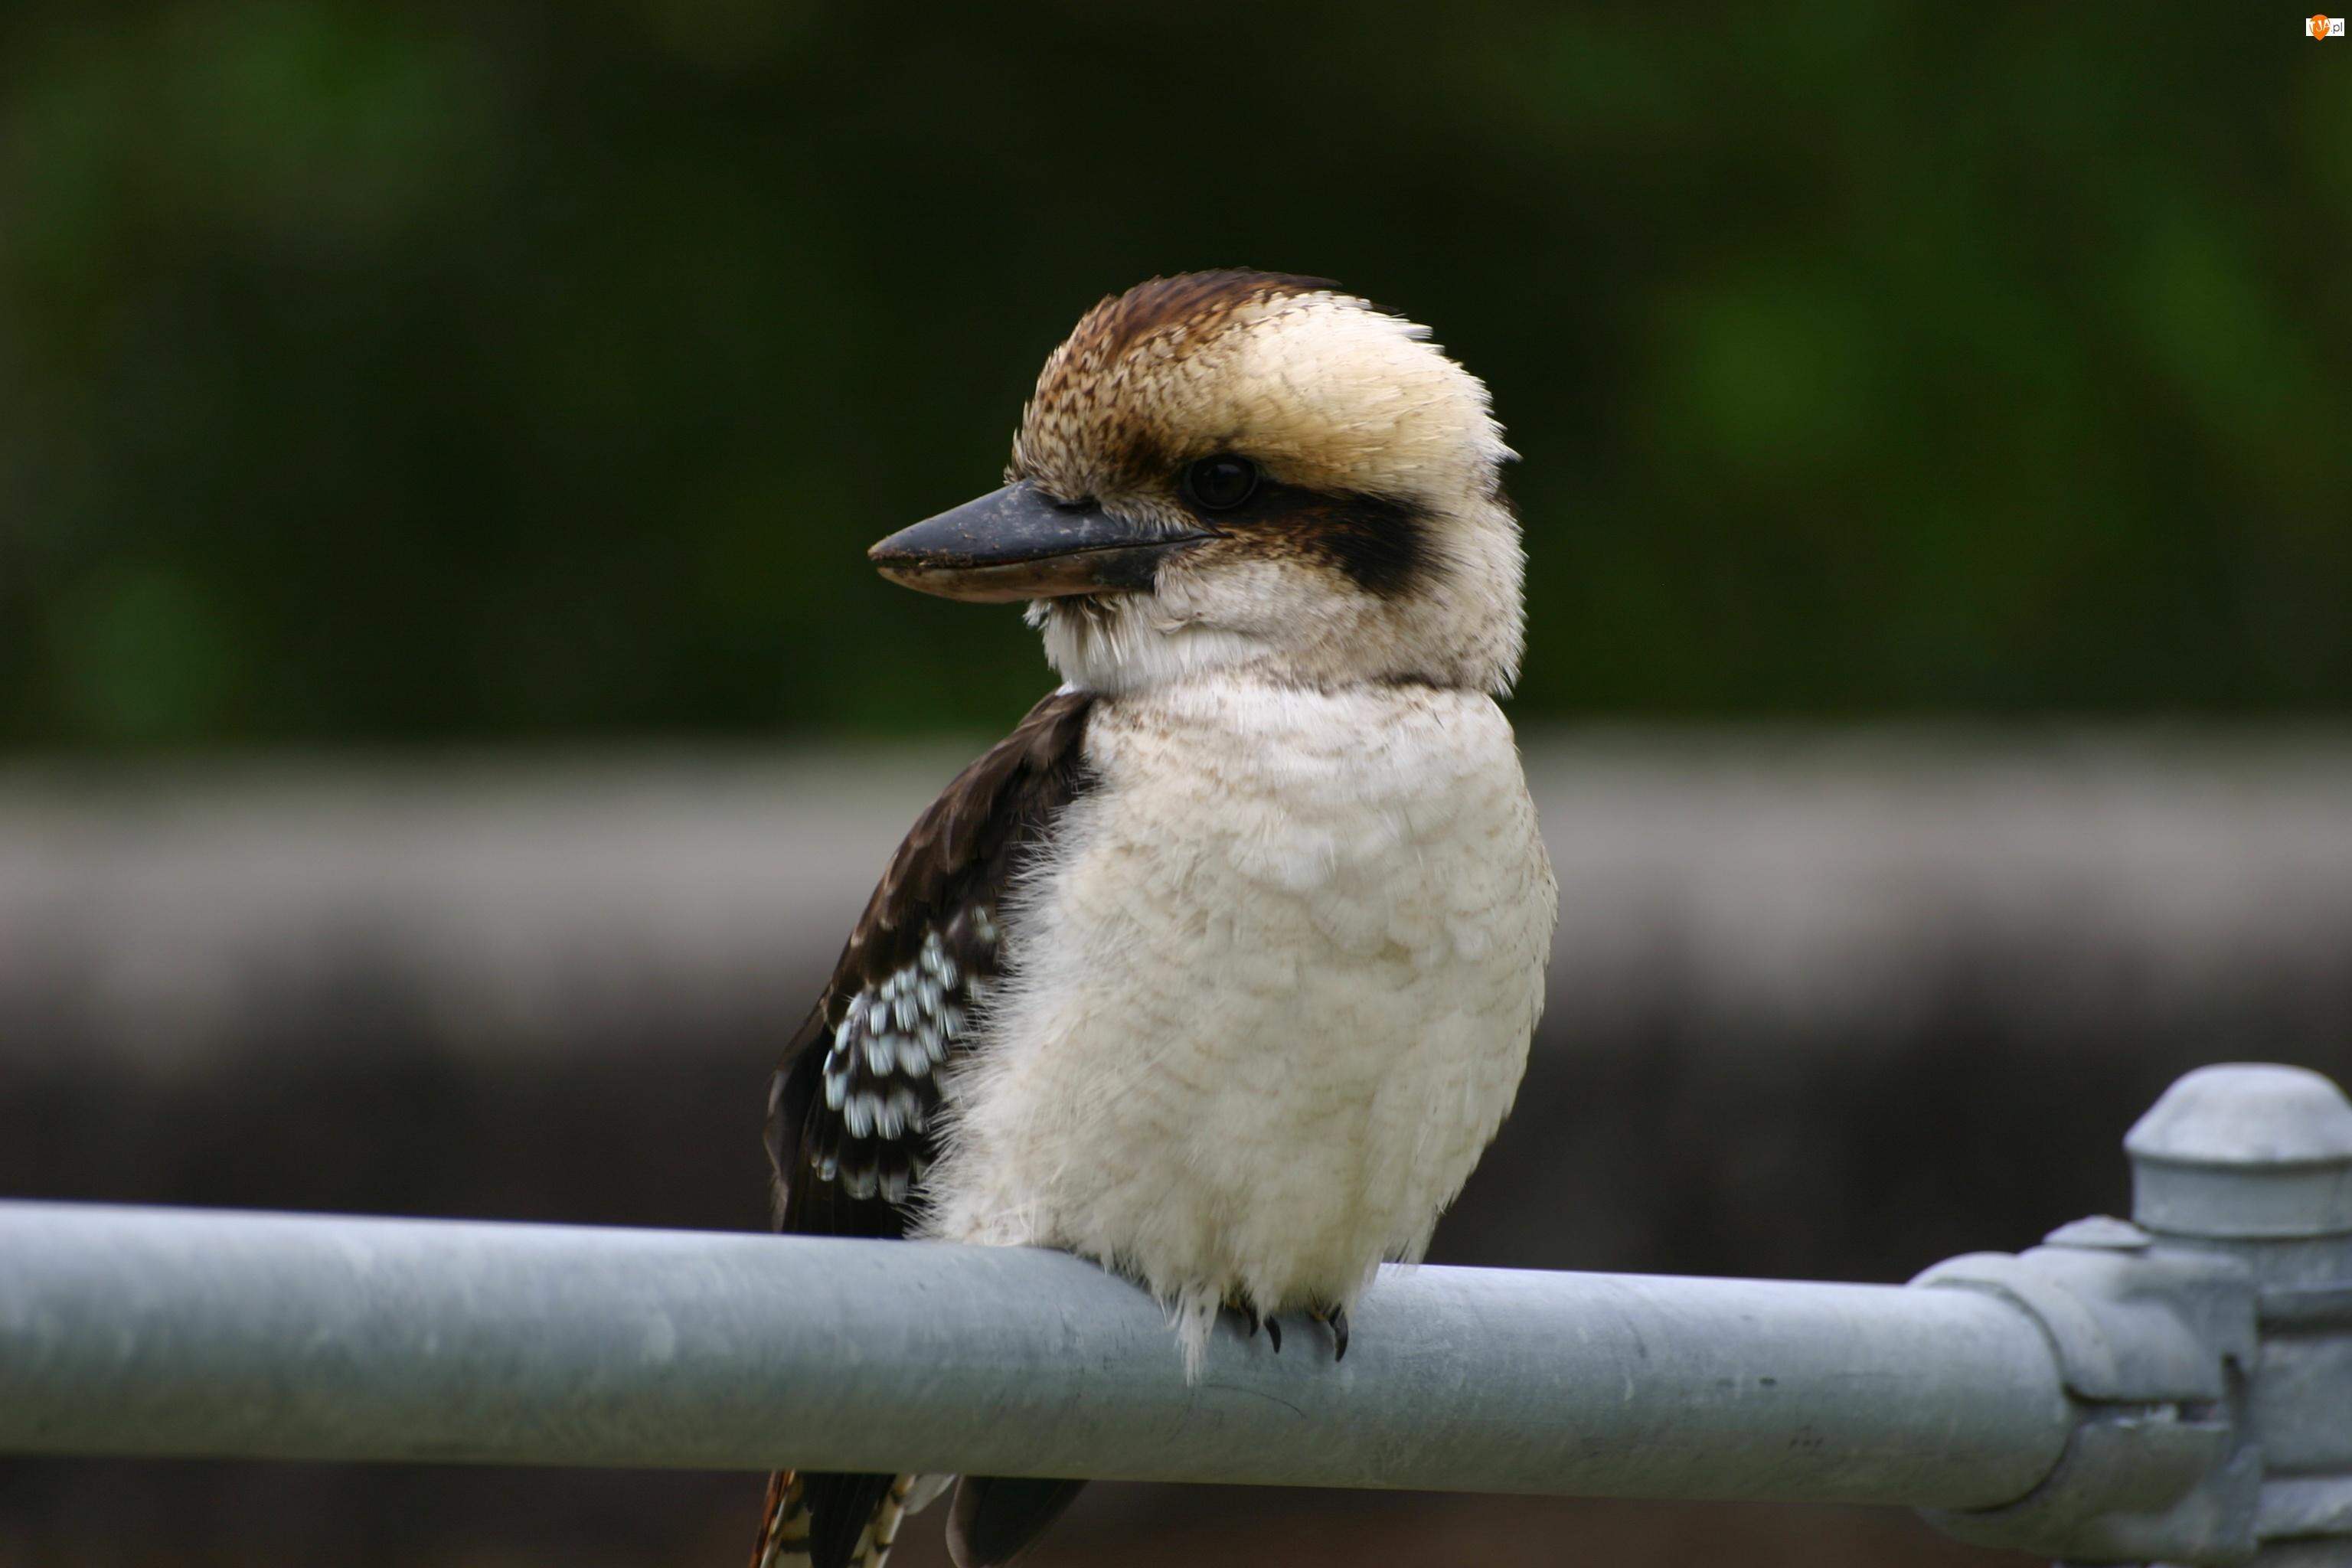 Ptak, Chichotliwa, Australijski, Kukabura